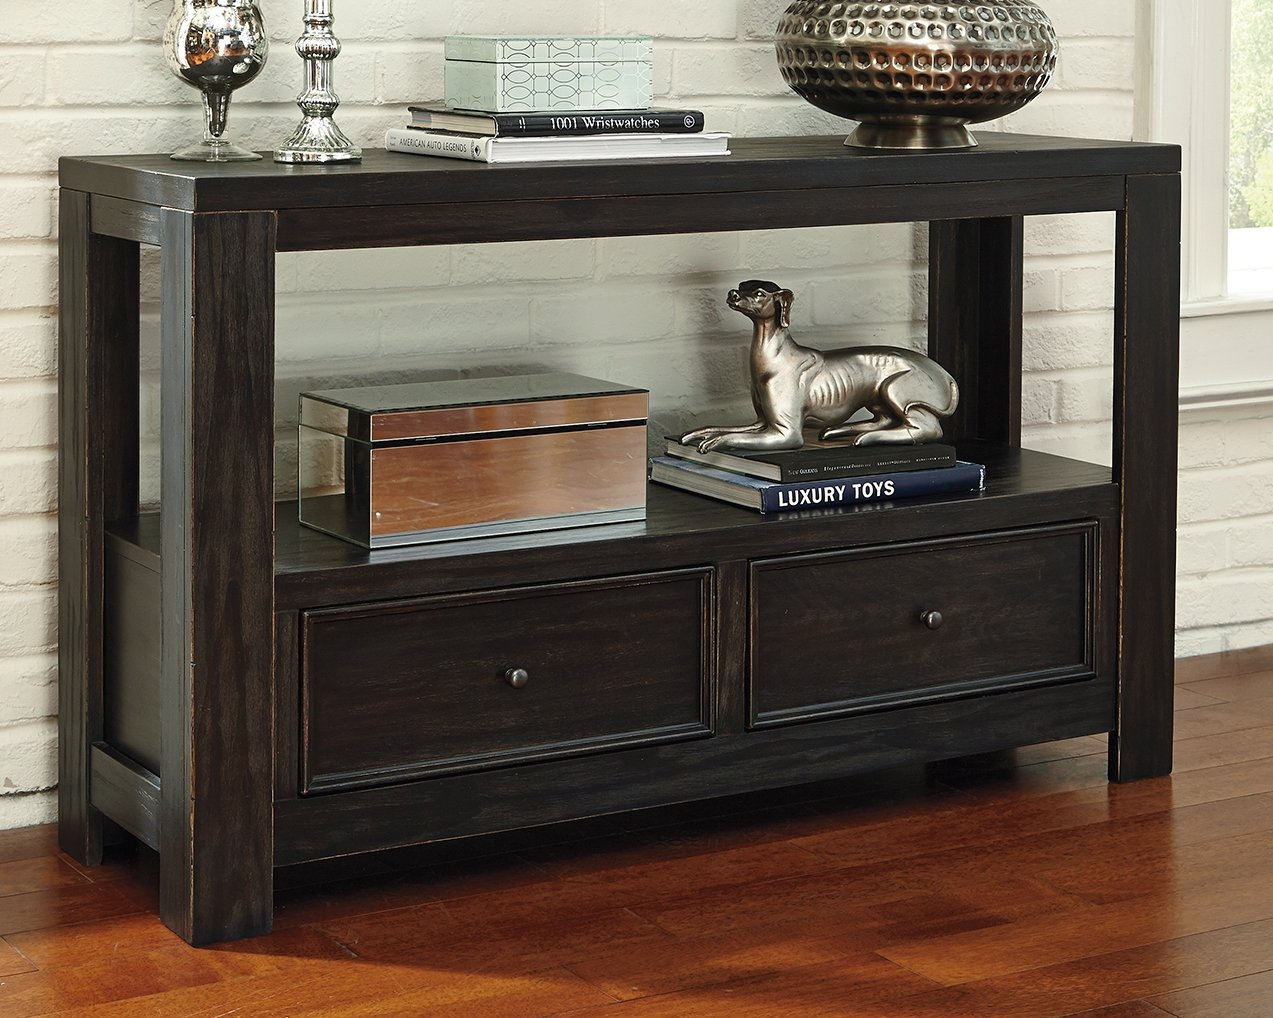 Ashley Furniture Signature Design – Gavelston Sofa Table Rubbed, Black